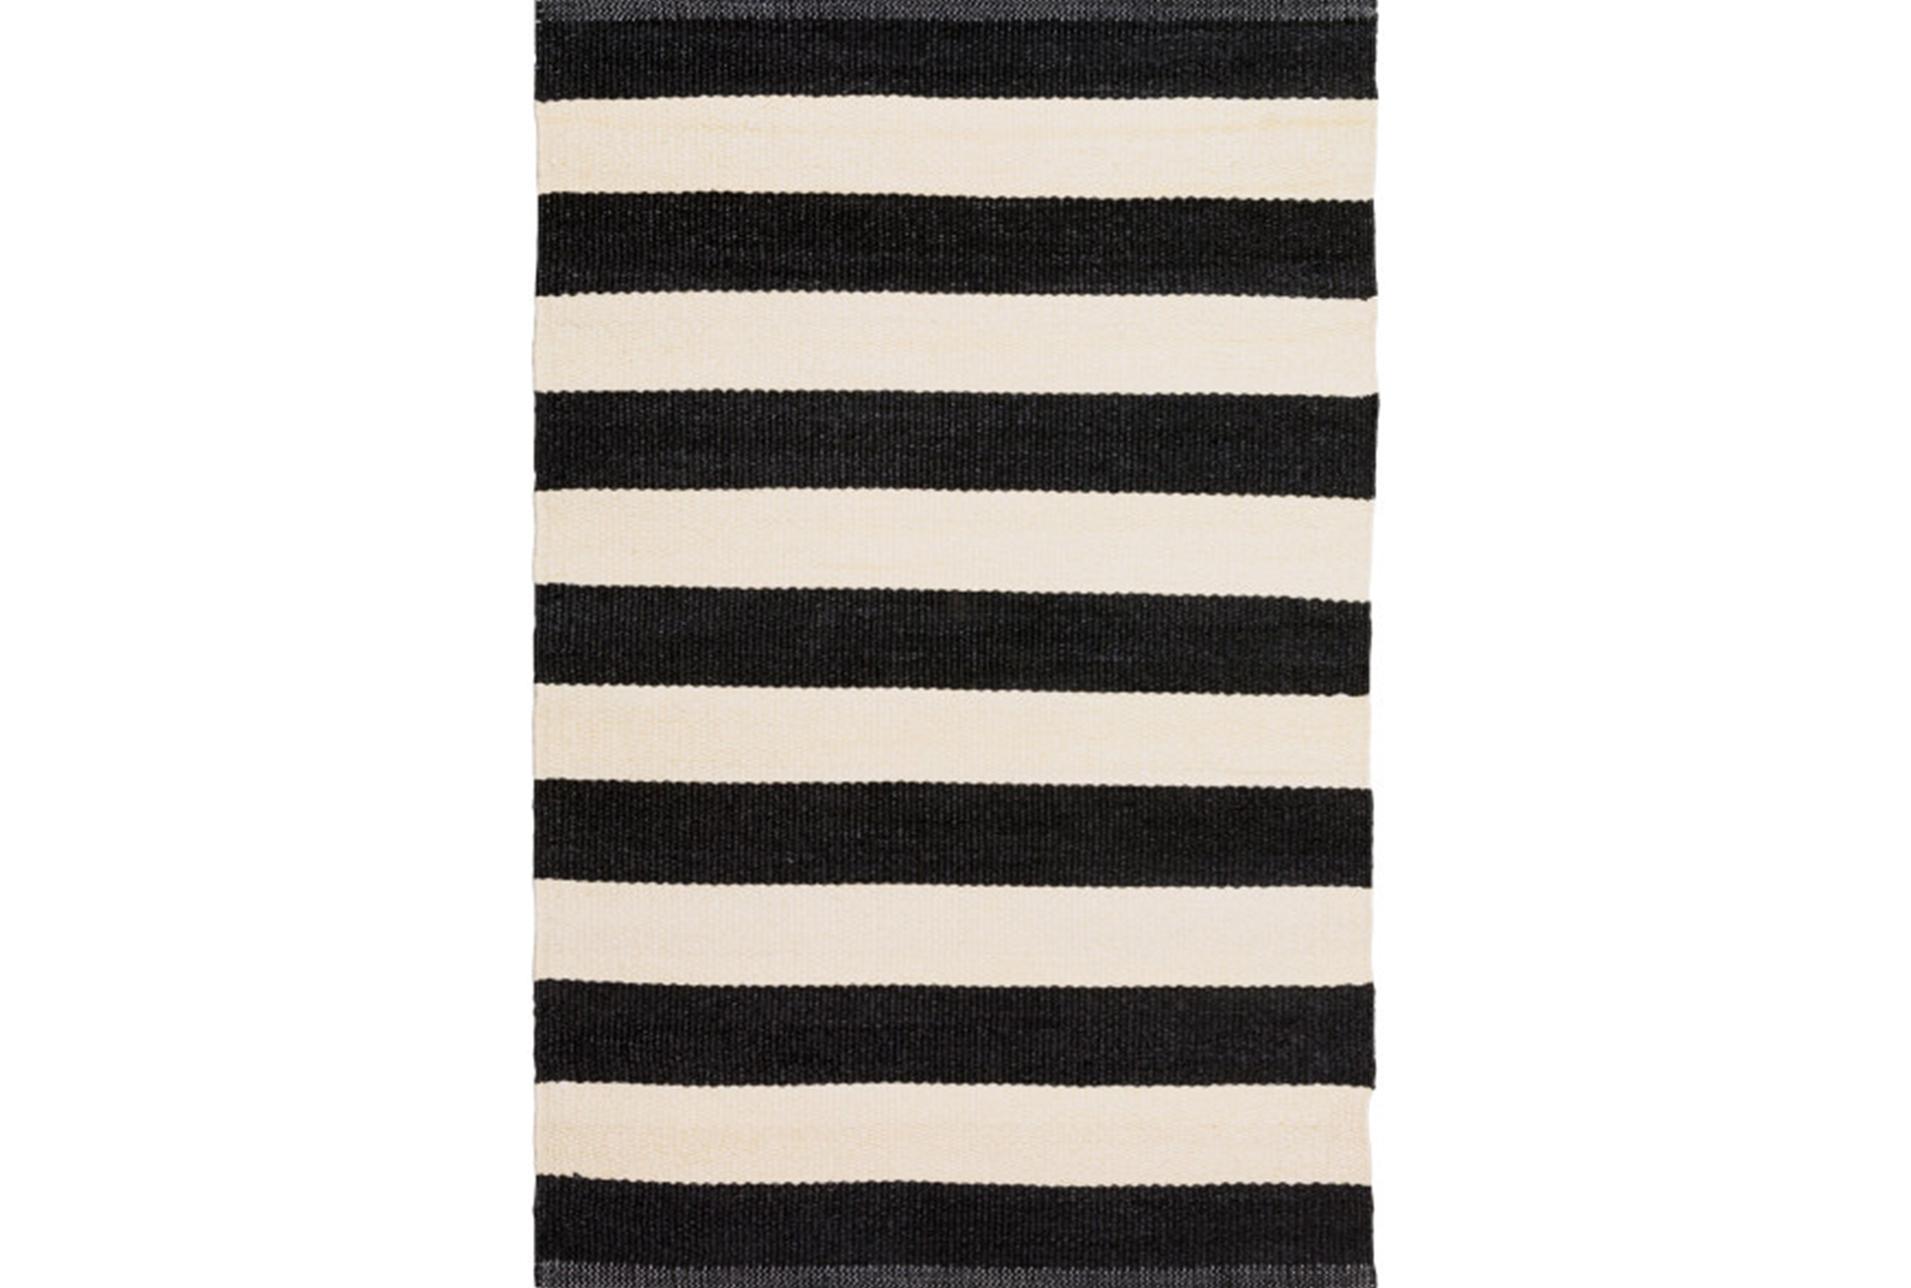 60x96 Outdoor Rug Black White Cabana Stripe